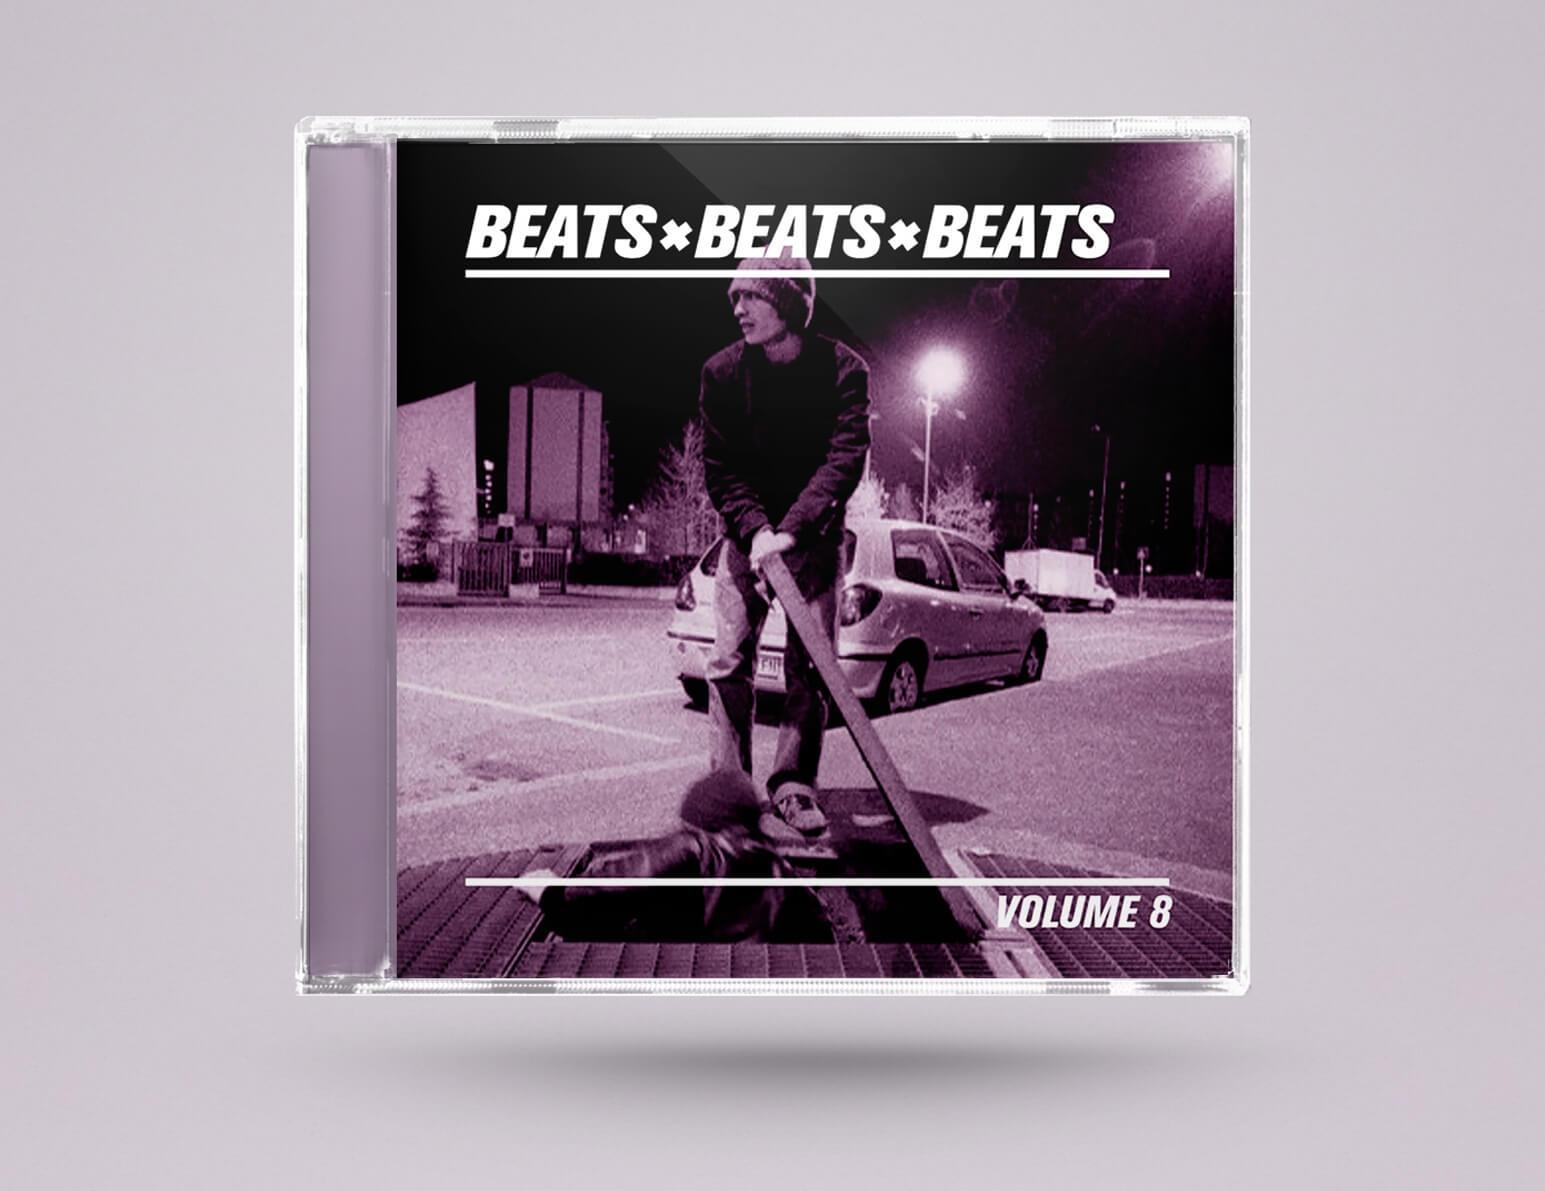 beats x beats x beats artwork